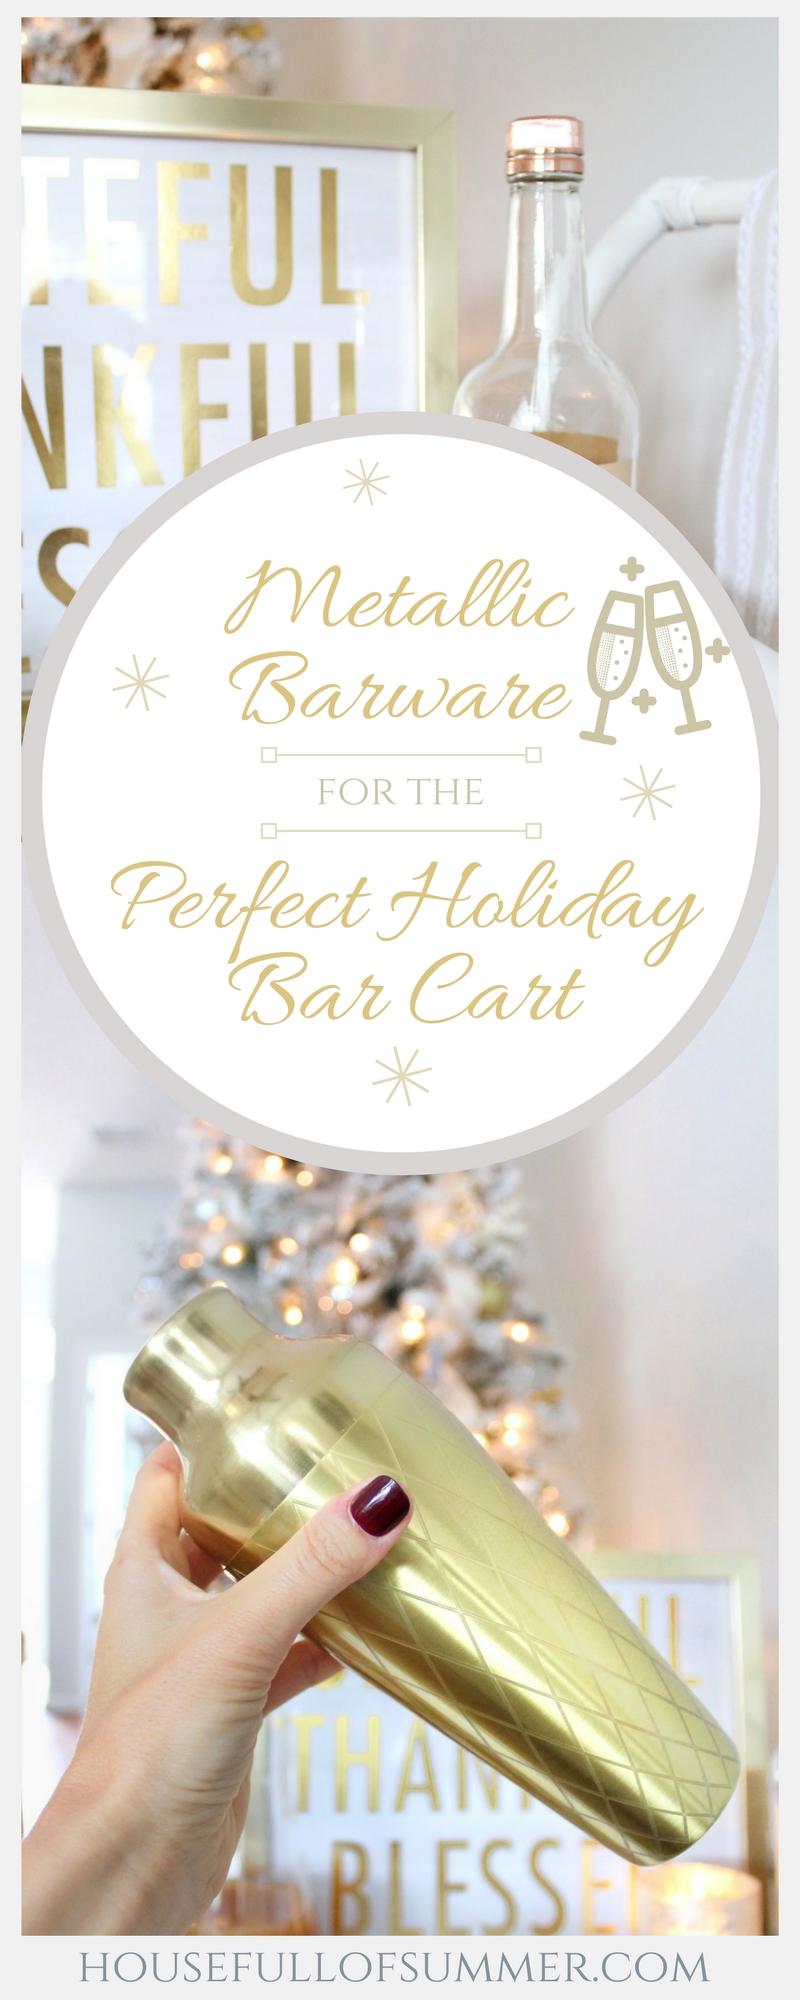 Metallic Barware for the Perfect Holiday Bar Cart | House Full of Summer blog white bar cart styling, coastal home thanksgiving christmas bar cart vonshef.us gold shaker, gold barware, gold cocktail set, matte black, copper cocktail set, fall cocktail recipe, apple cider